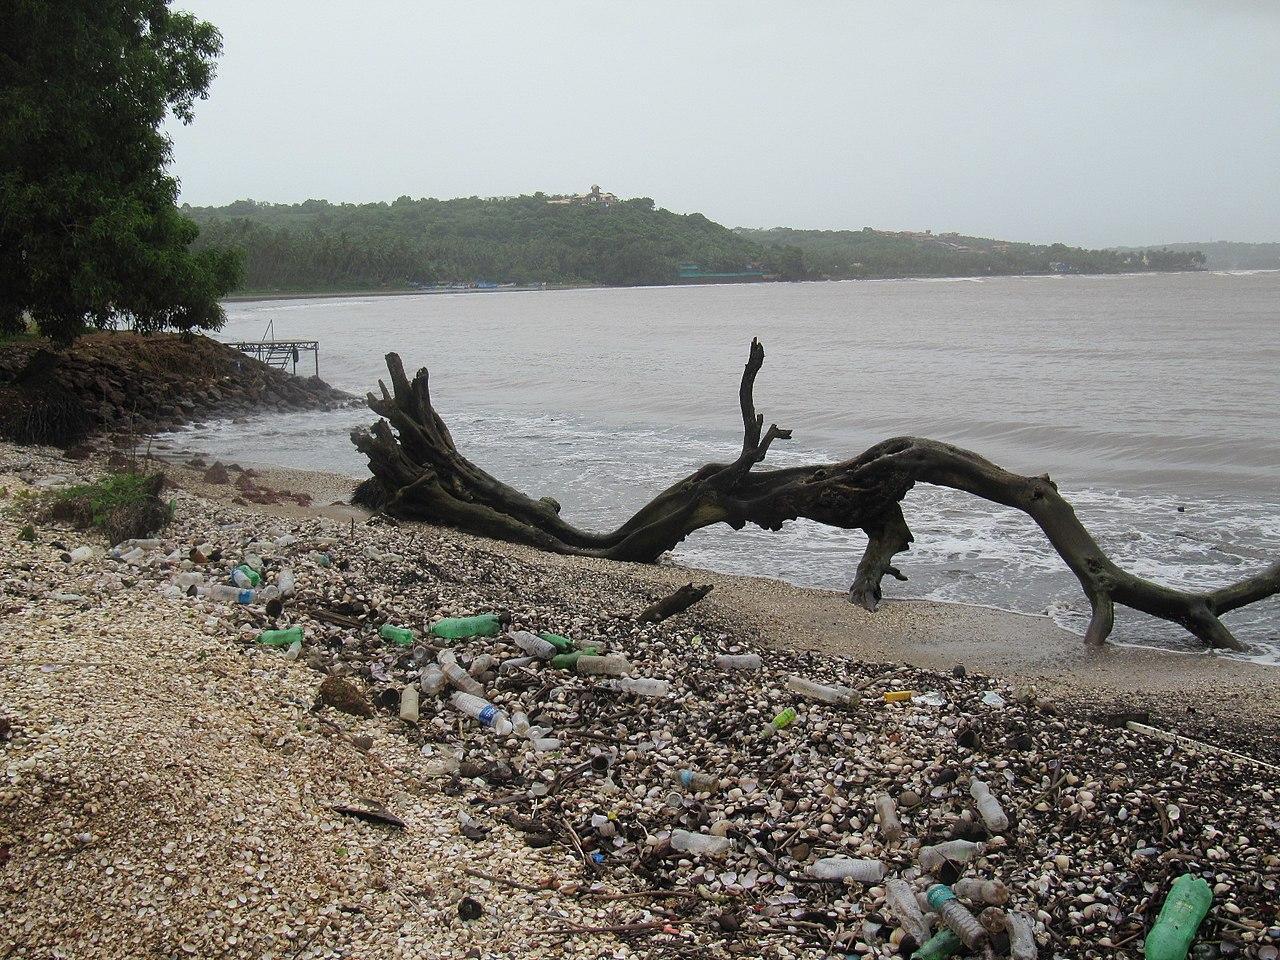 Plastic pollution often accumulates on beaches.